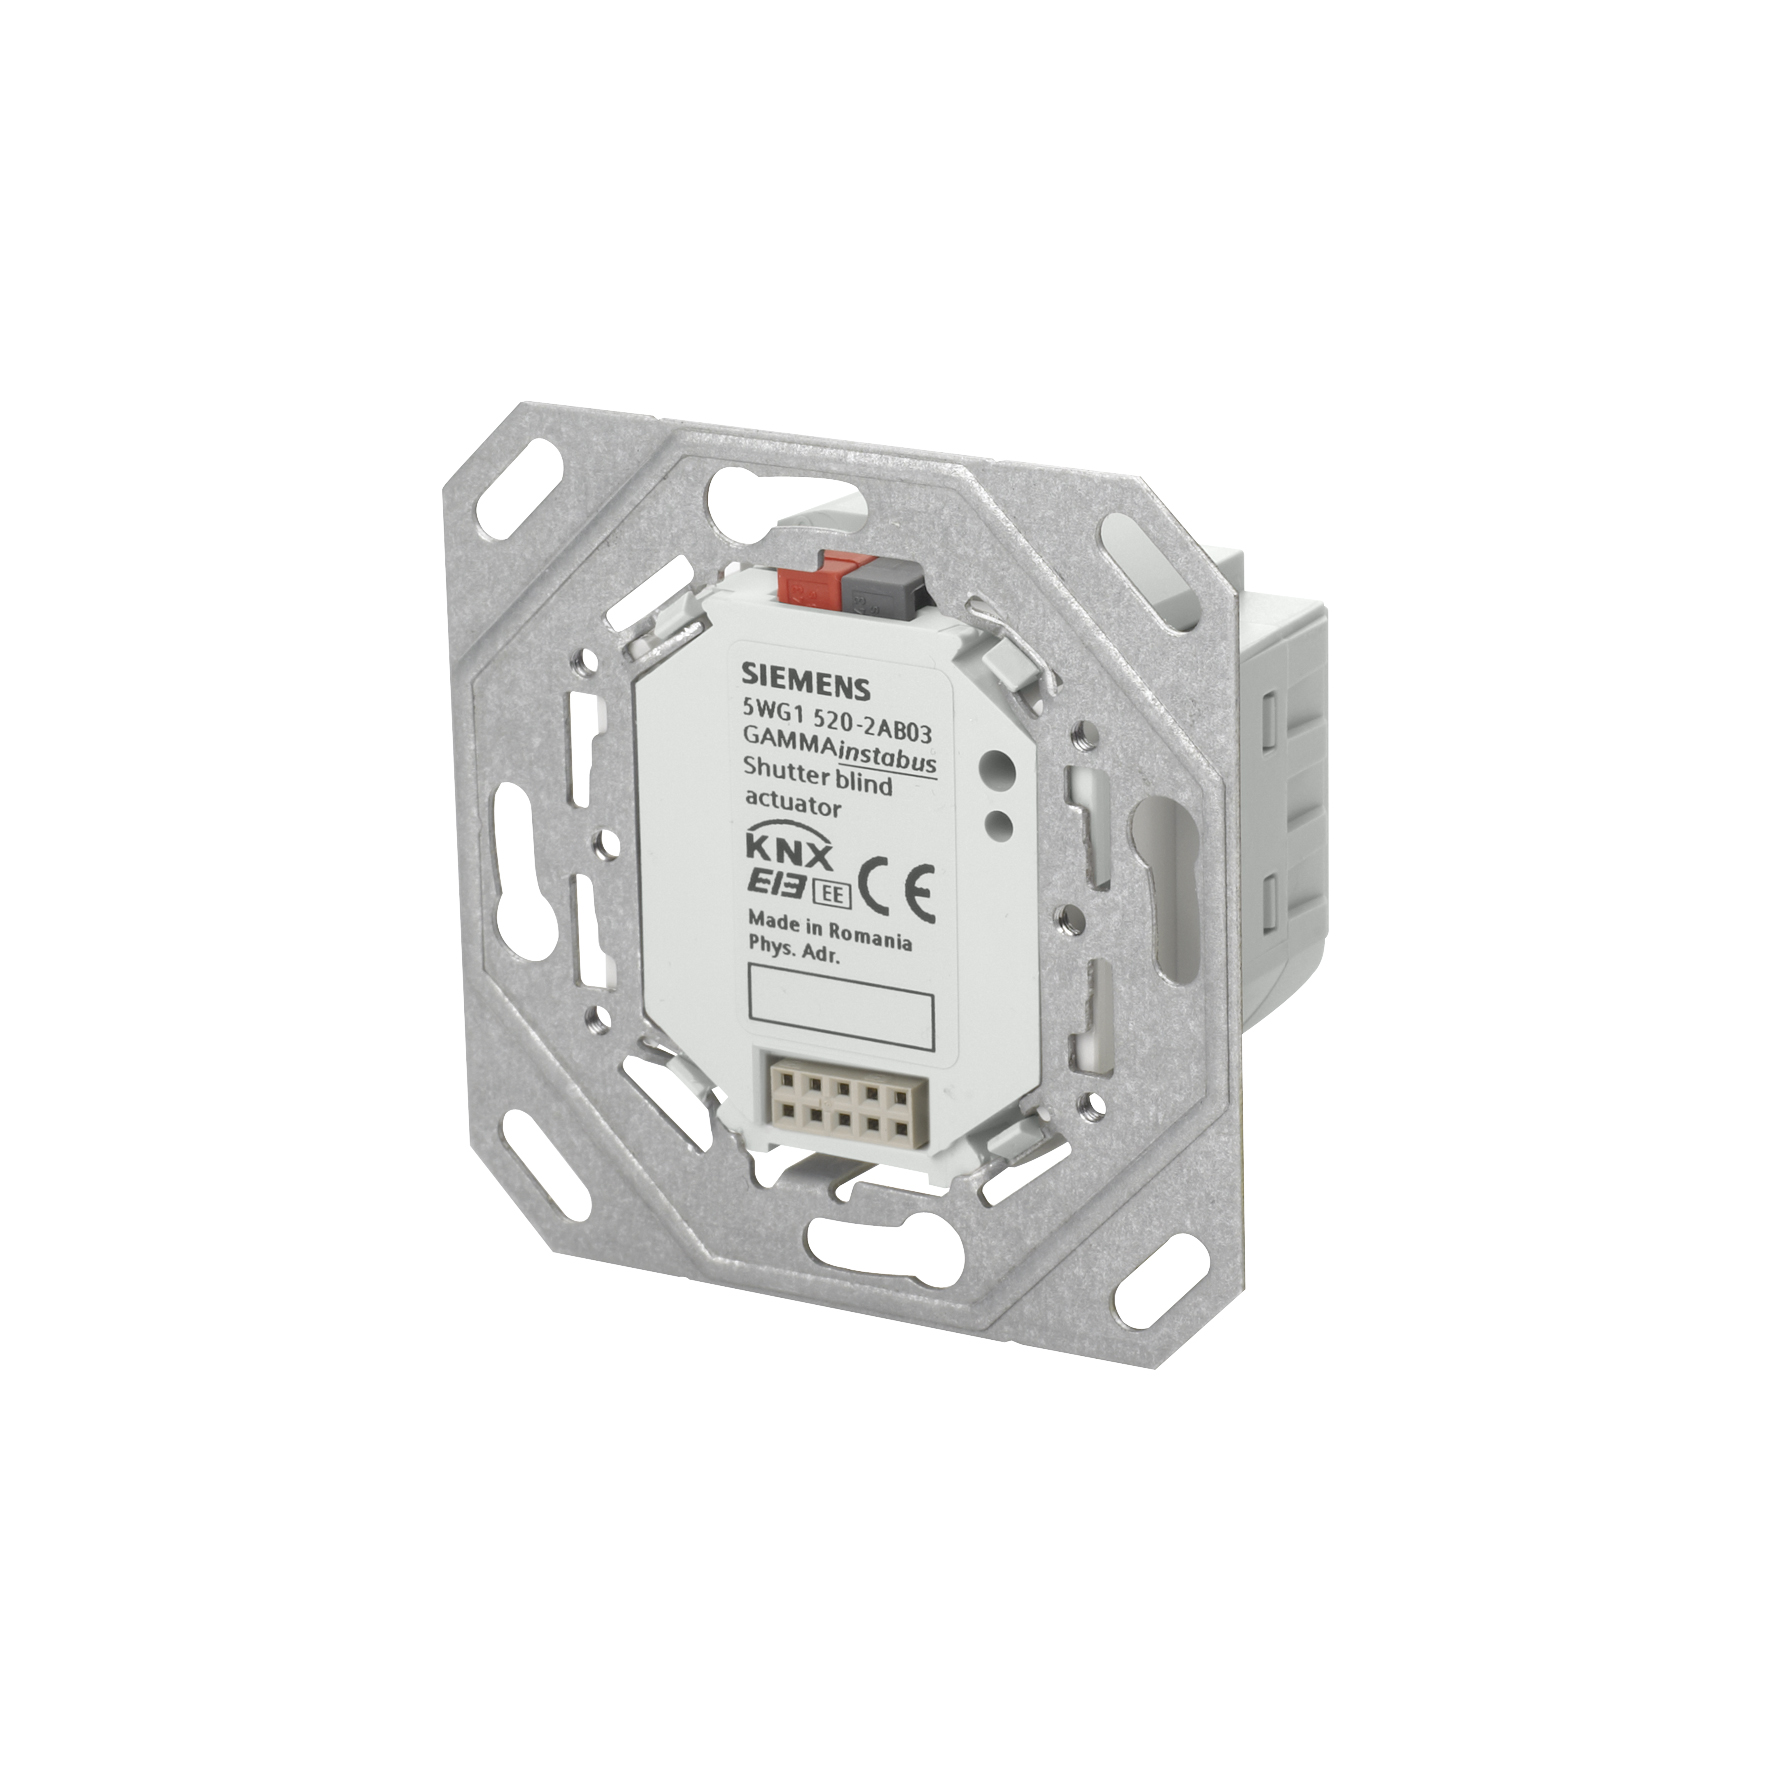 1 Stk Jalousieaktor, 1 x AC 230 V, 6 A, Hängebügel, BTI-Buchse KX5202AB03